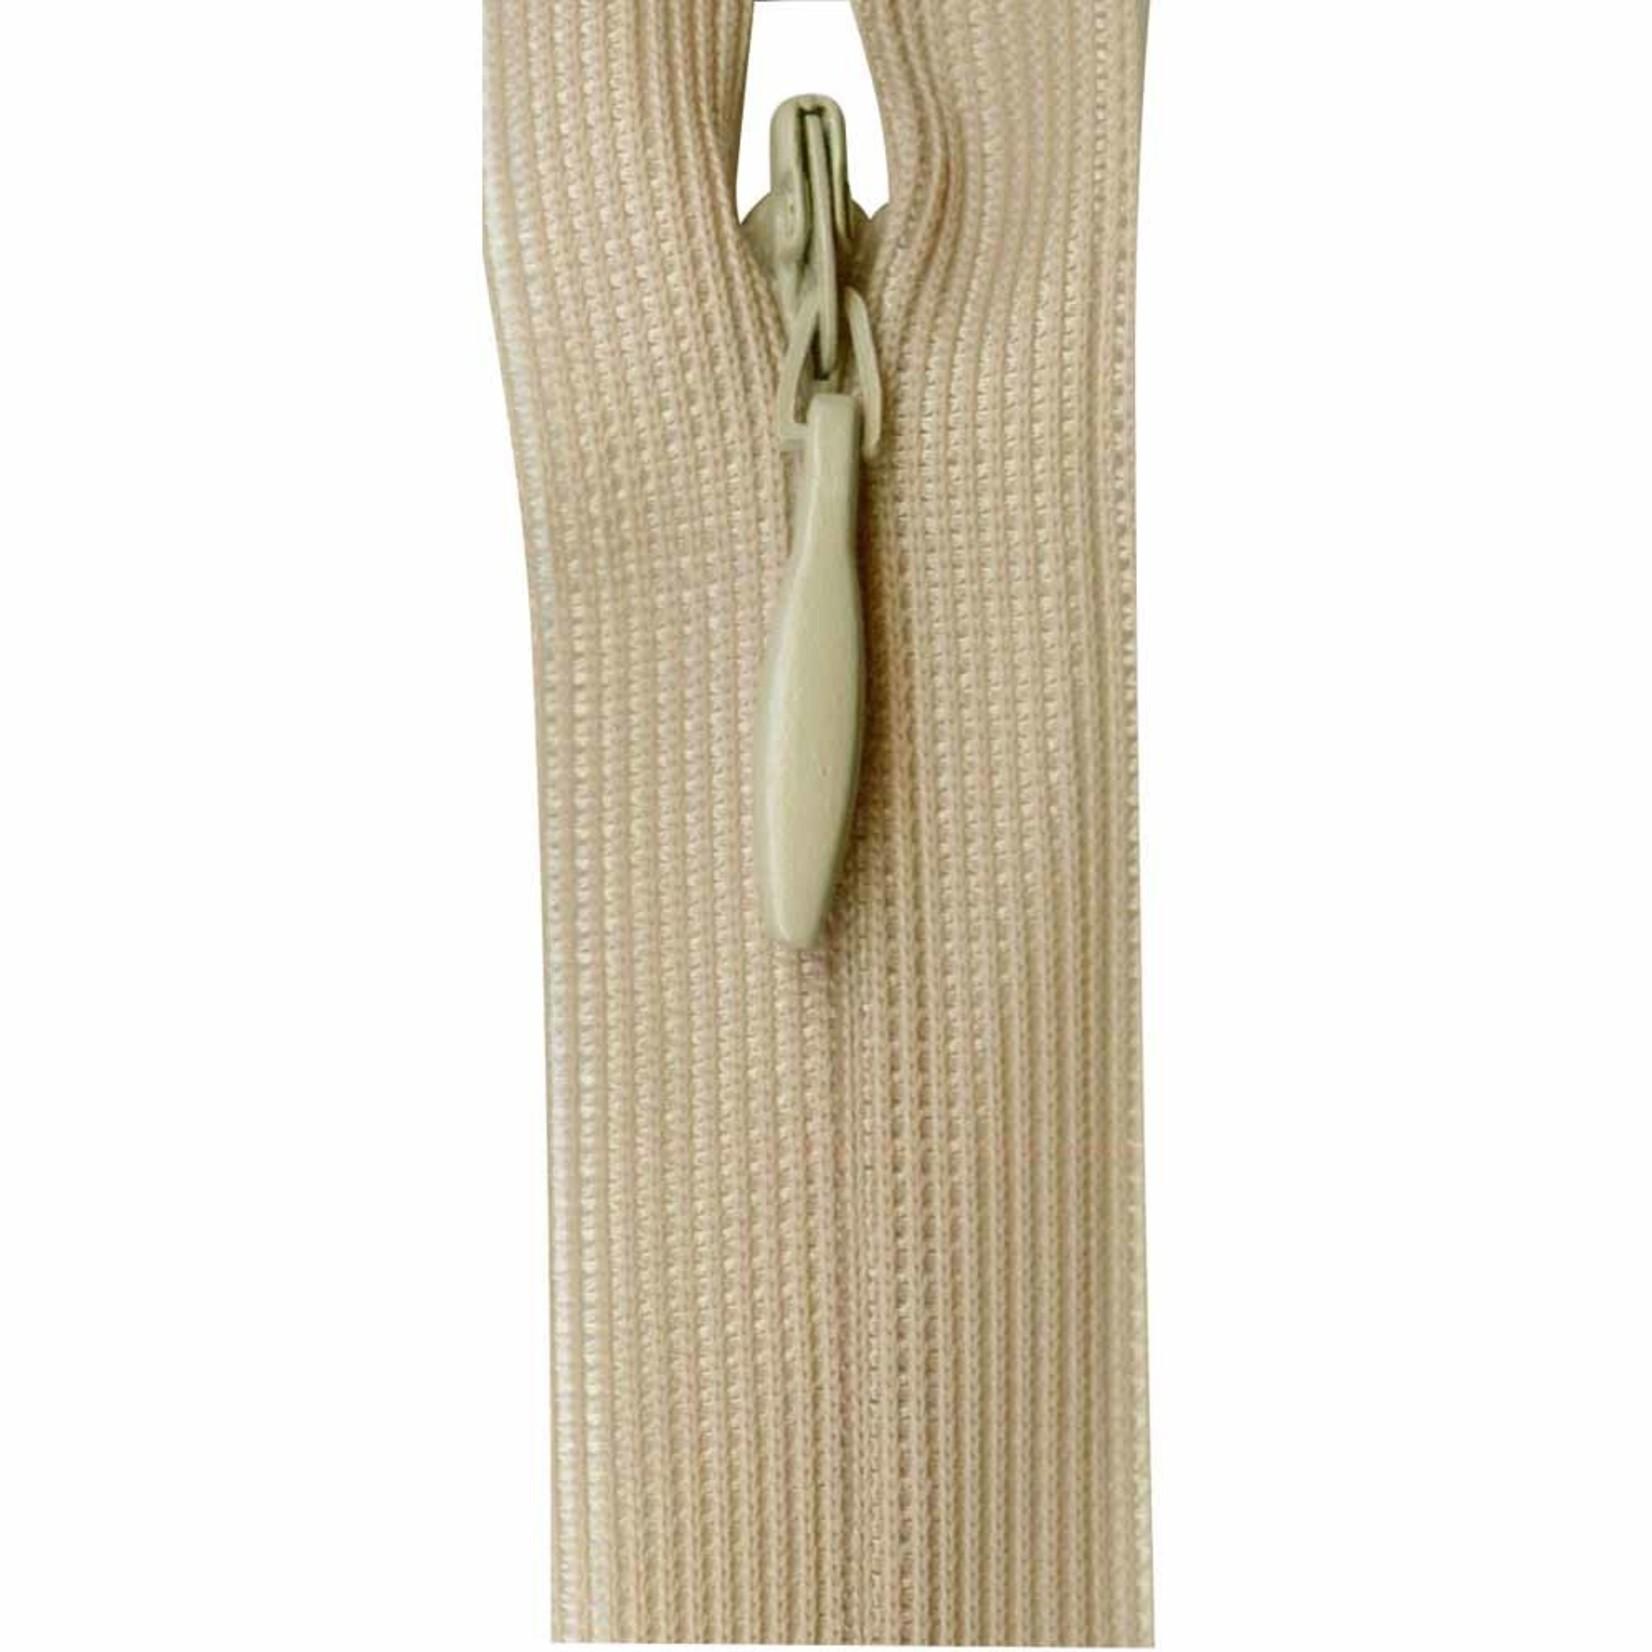 Costumakers Invisible Zipper 20cm